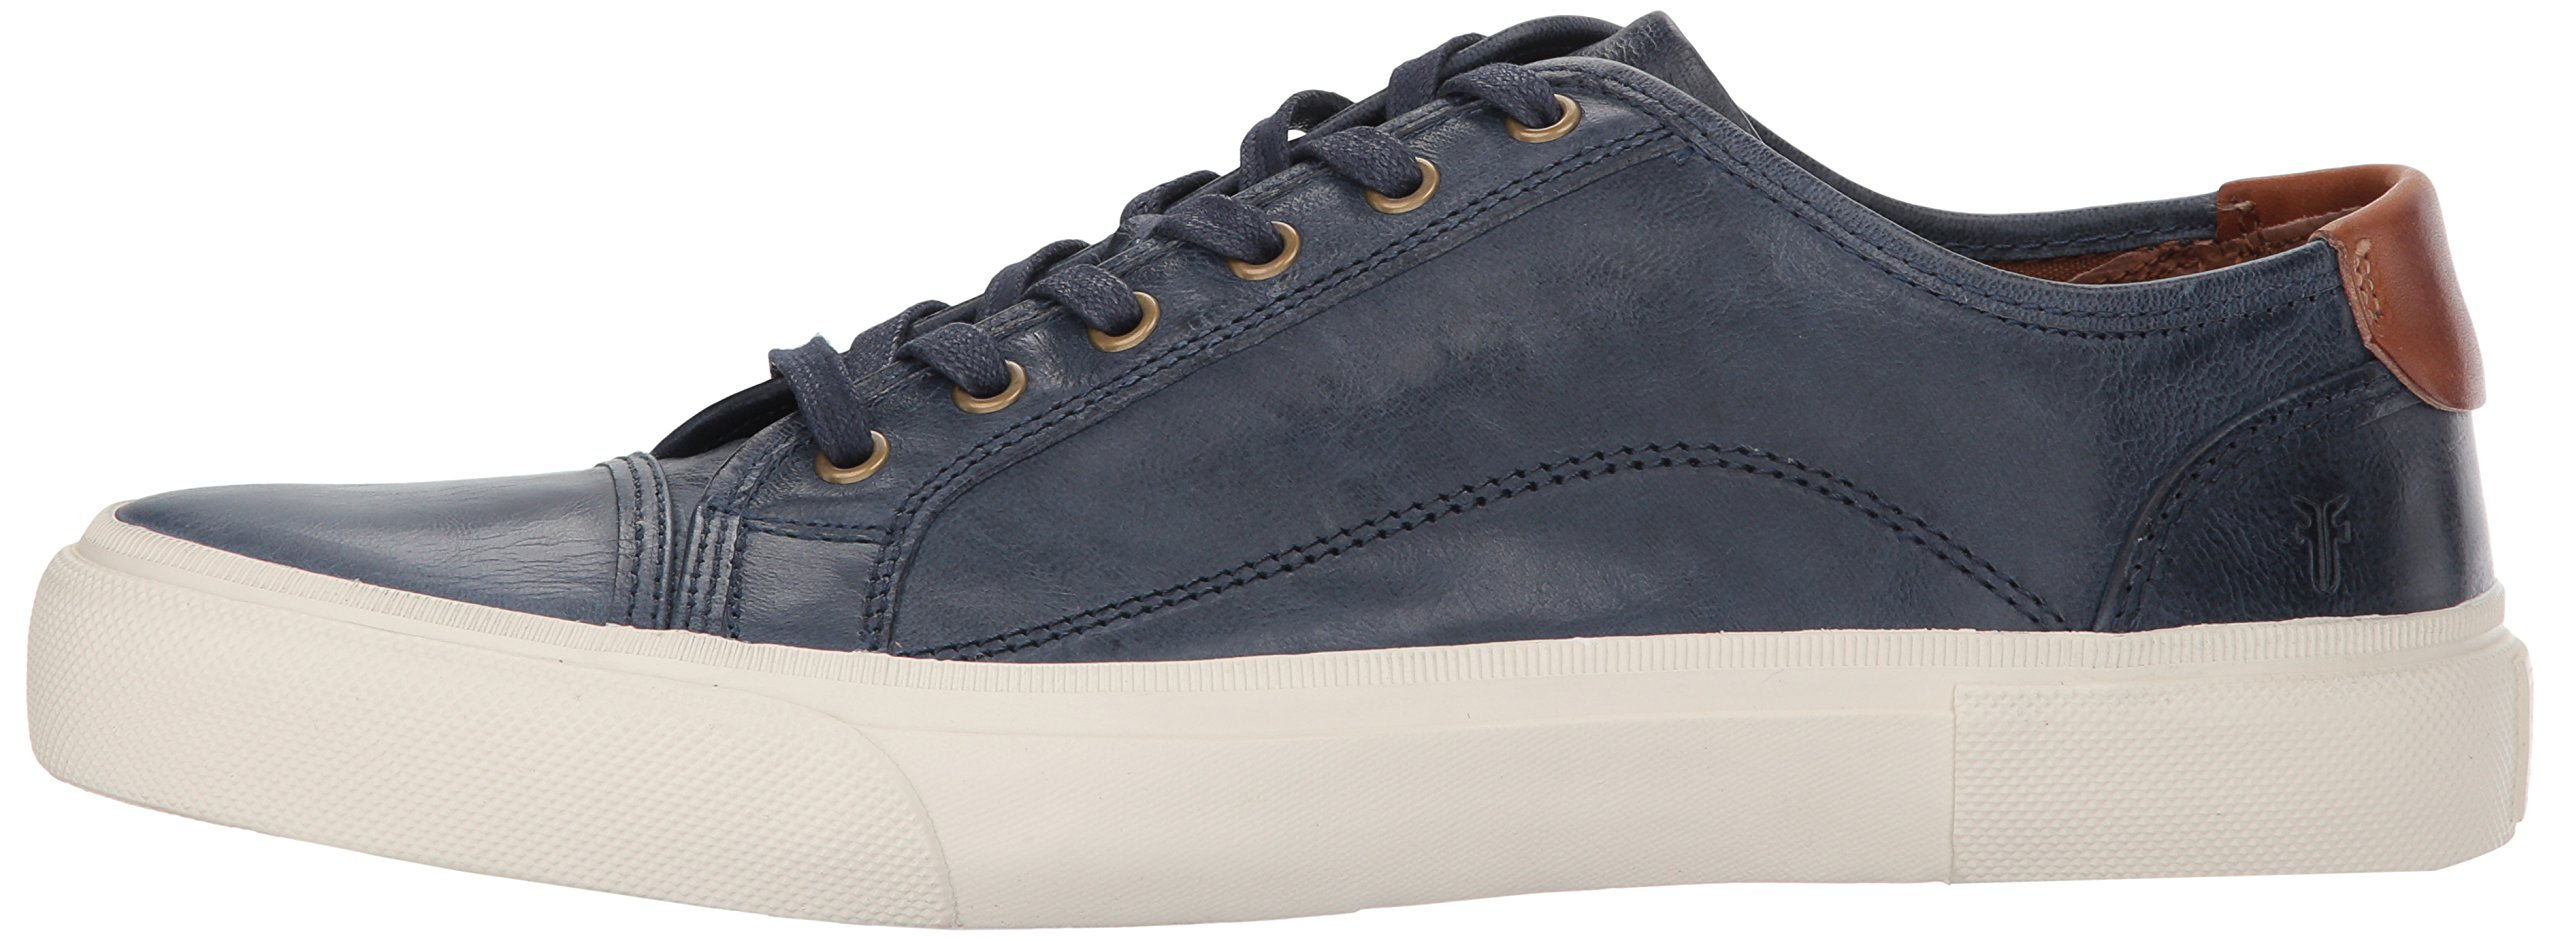 FRYE Men's Ludlow Cap Lowlace Sneaker, Navy, 11 Medium US by FRYE (Image #5)